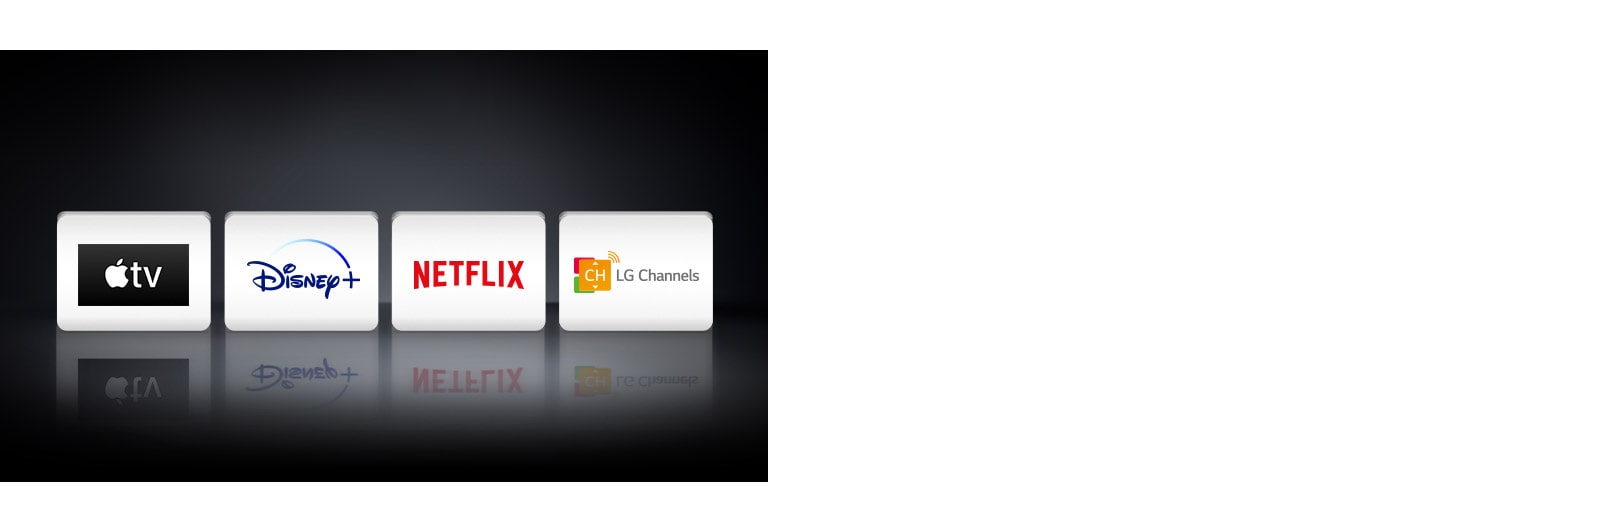 Quattro loghi: app Apple TV, Disney+, Netflix e LG Channels